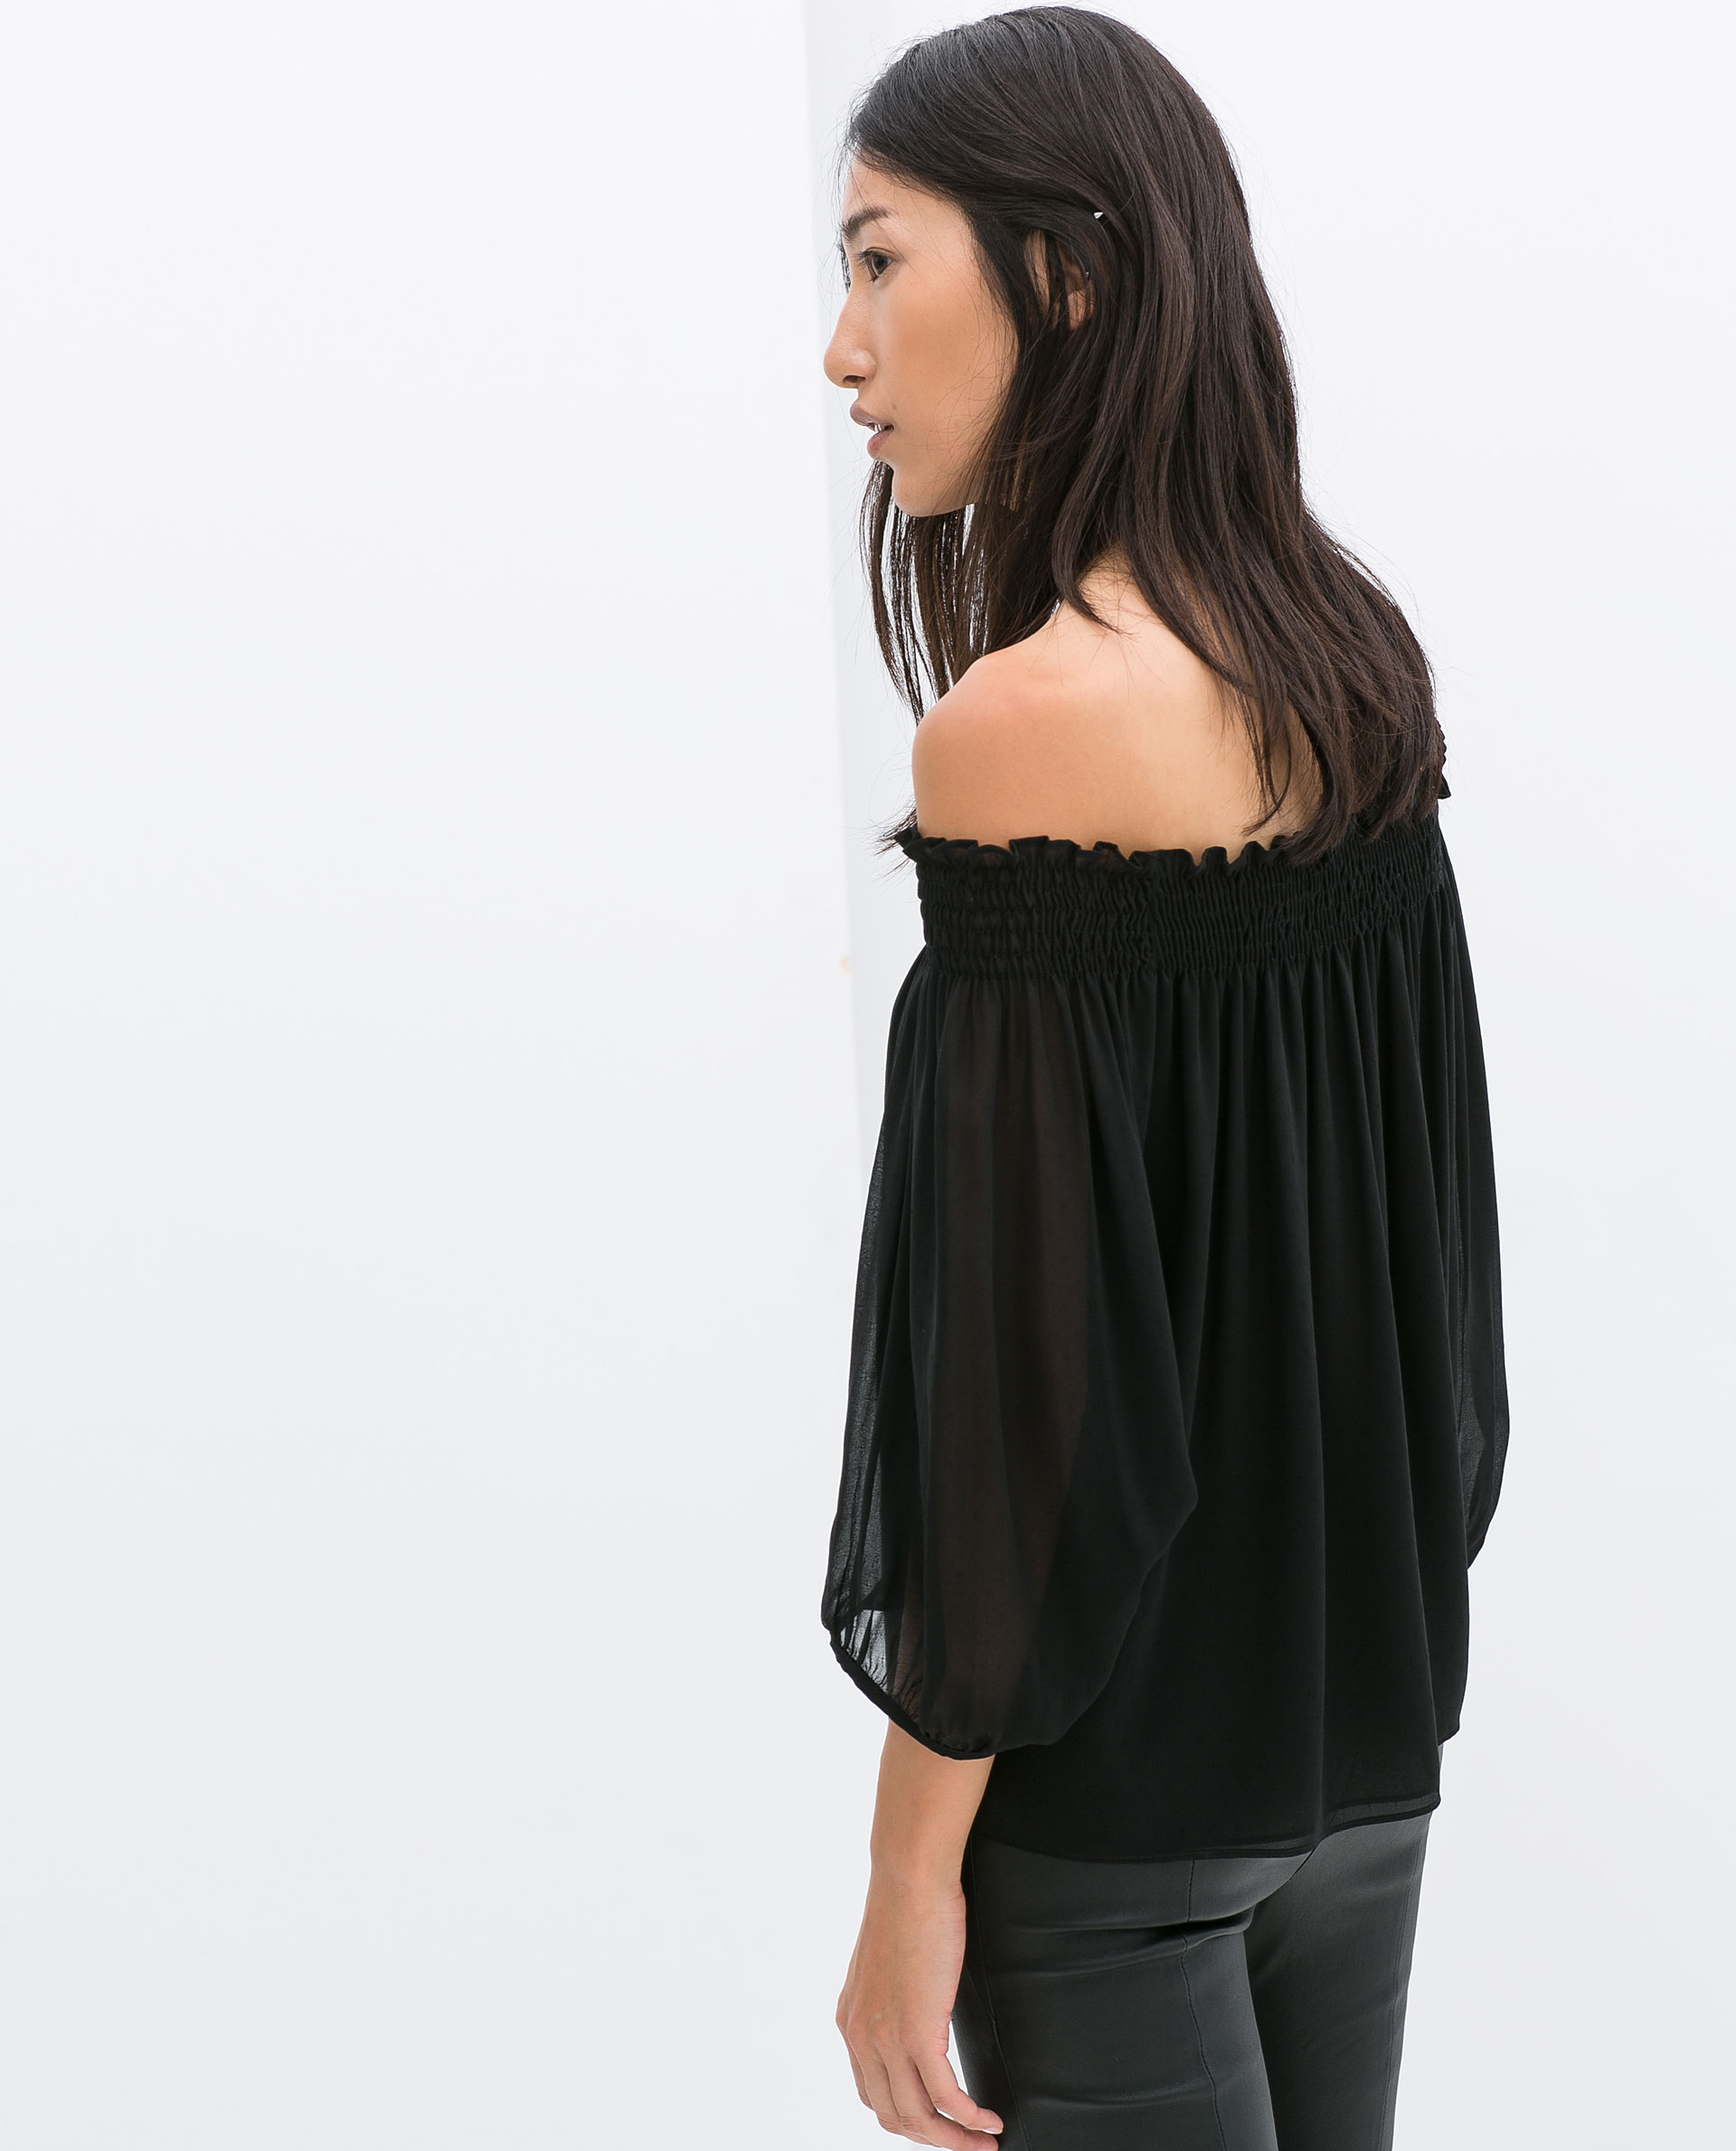 Zara Sheer Black Blouse 59